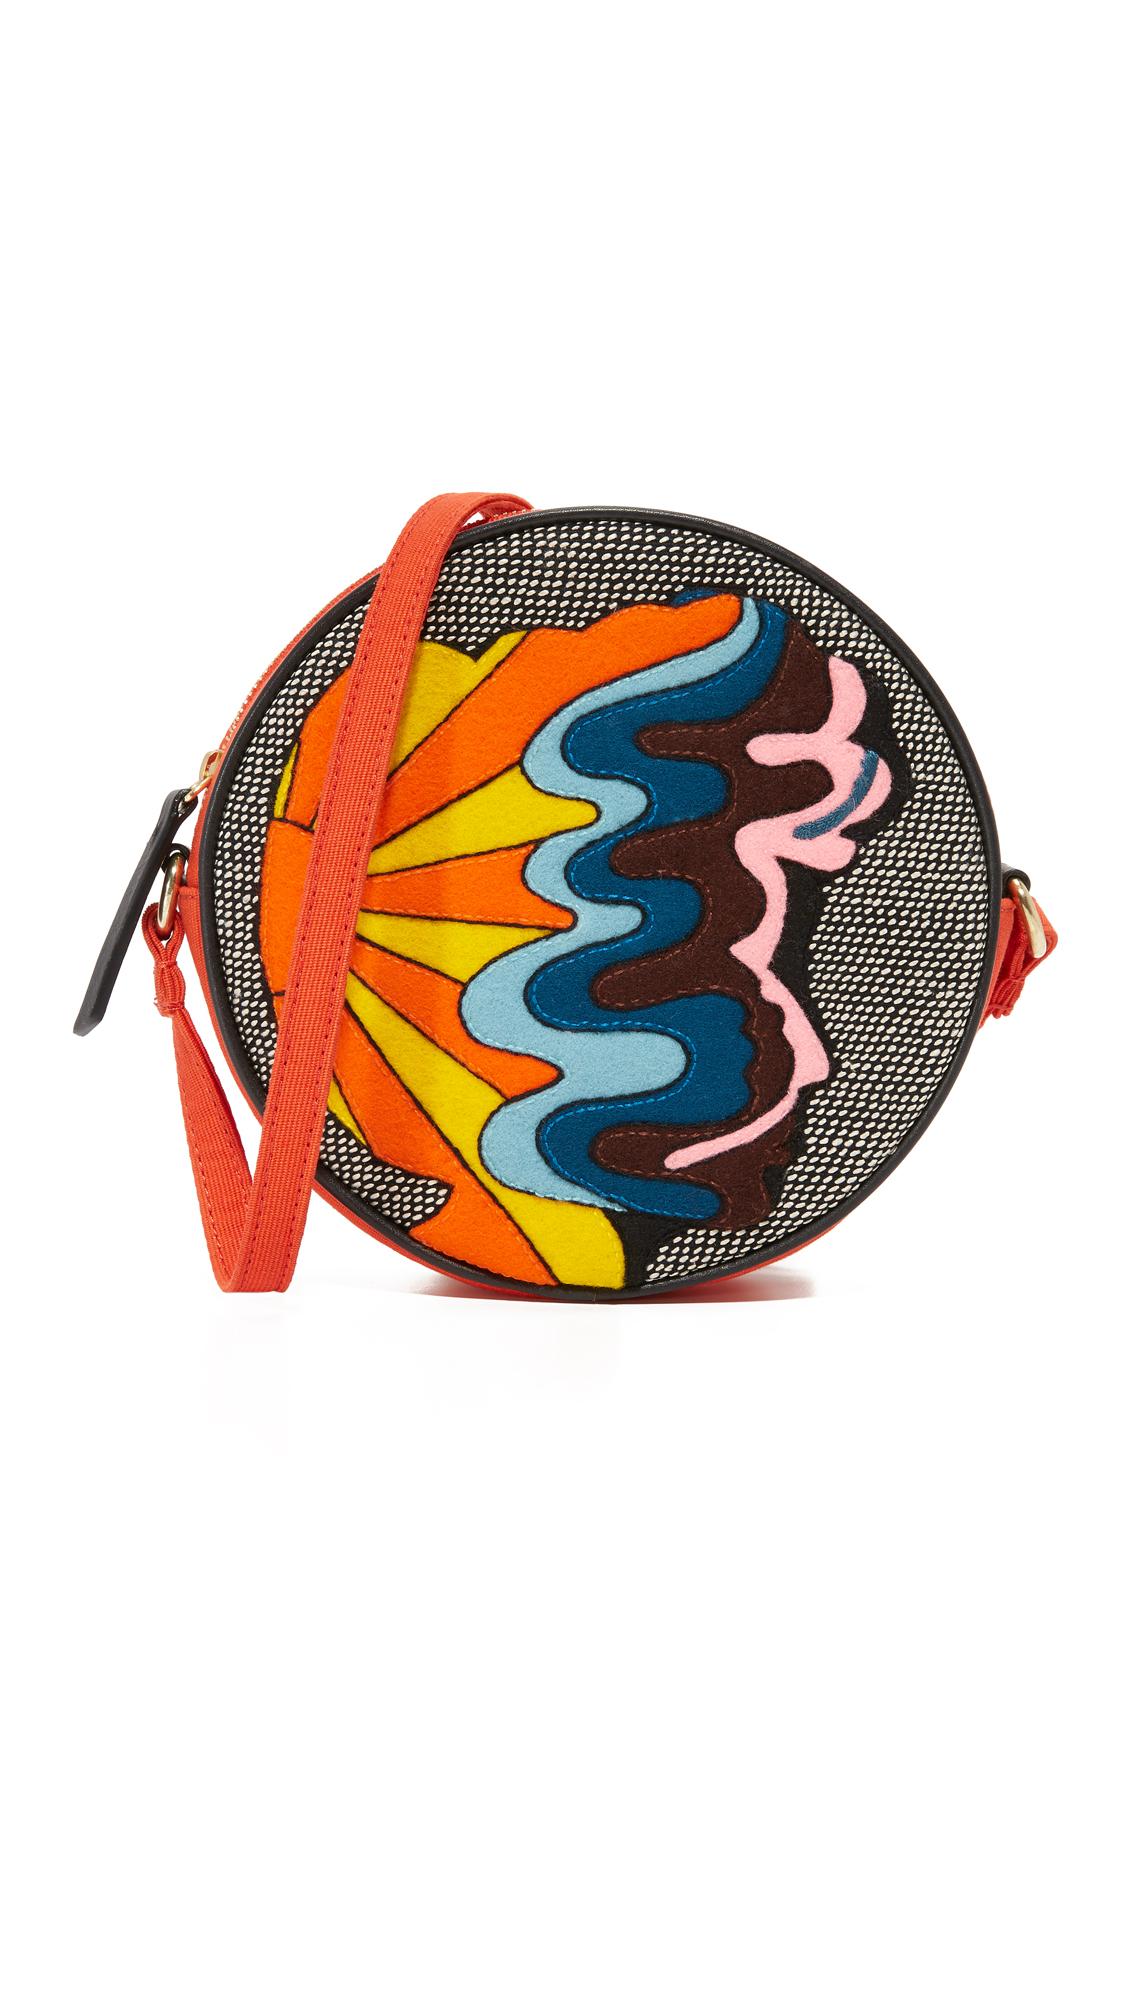 olympia letan female olympia letan combination messenger bag orange